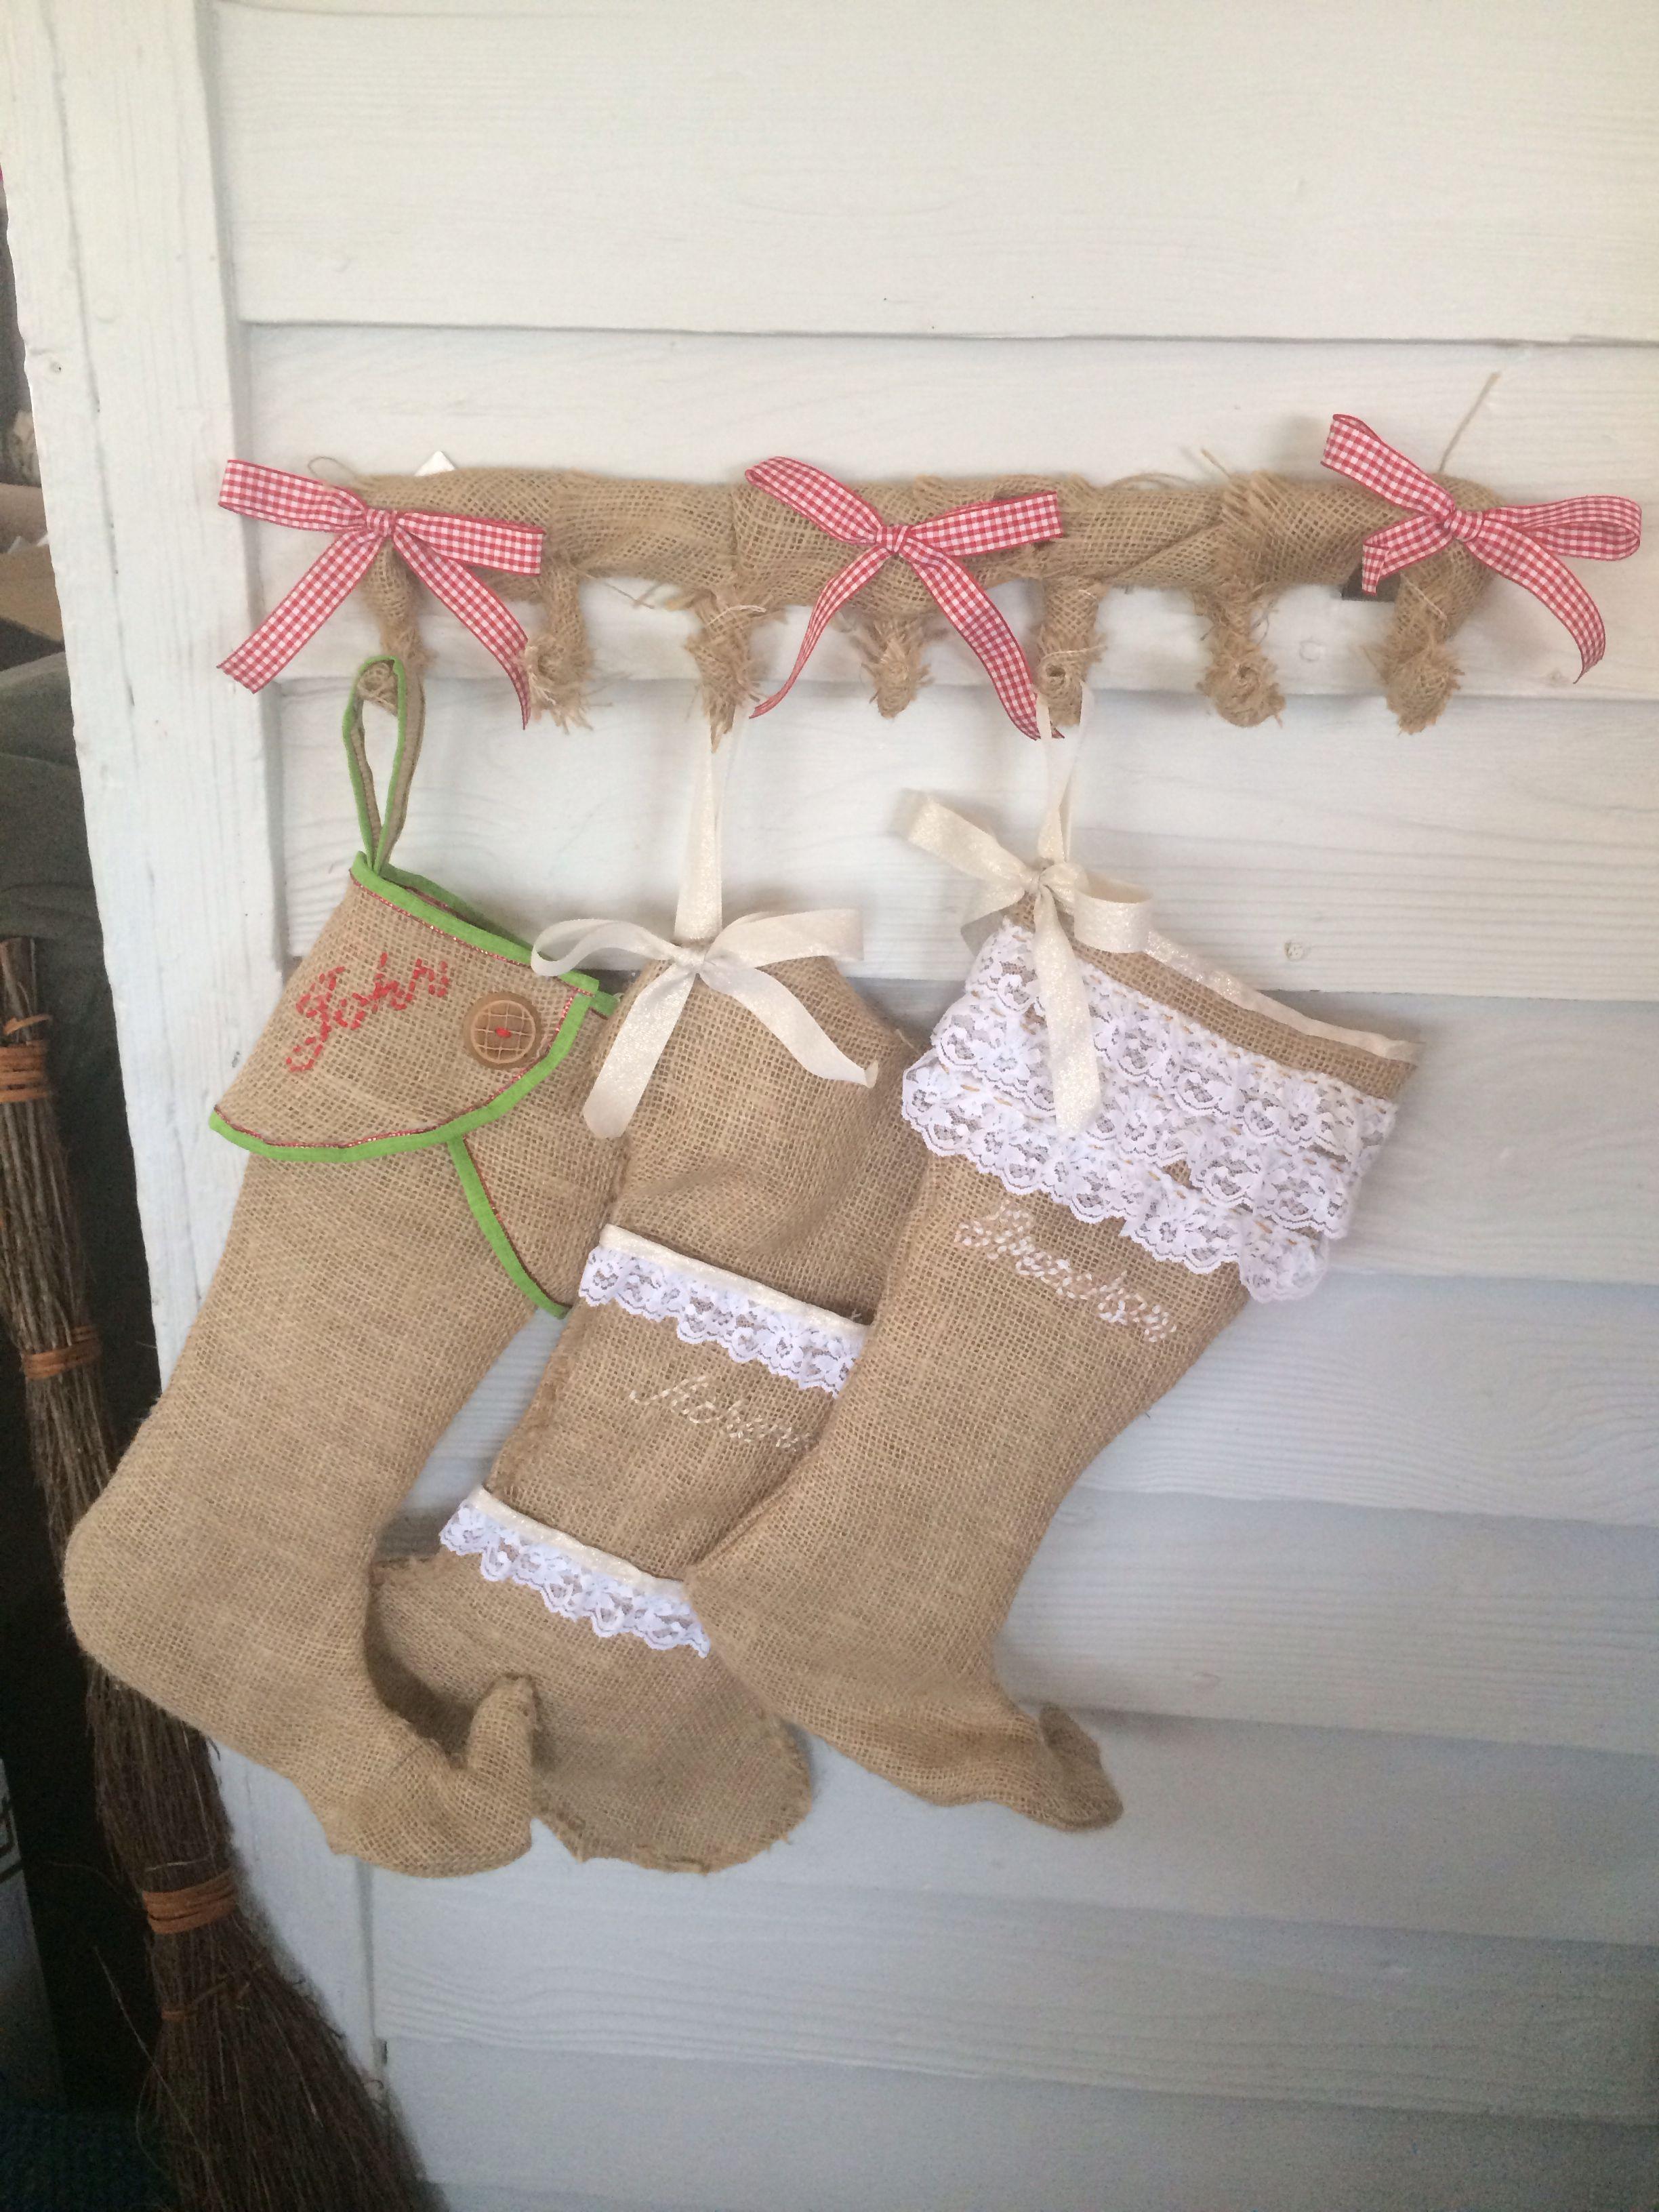 My 2 stocking hanger. Hanger from dollar tree that I